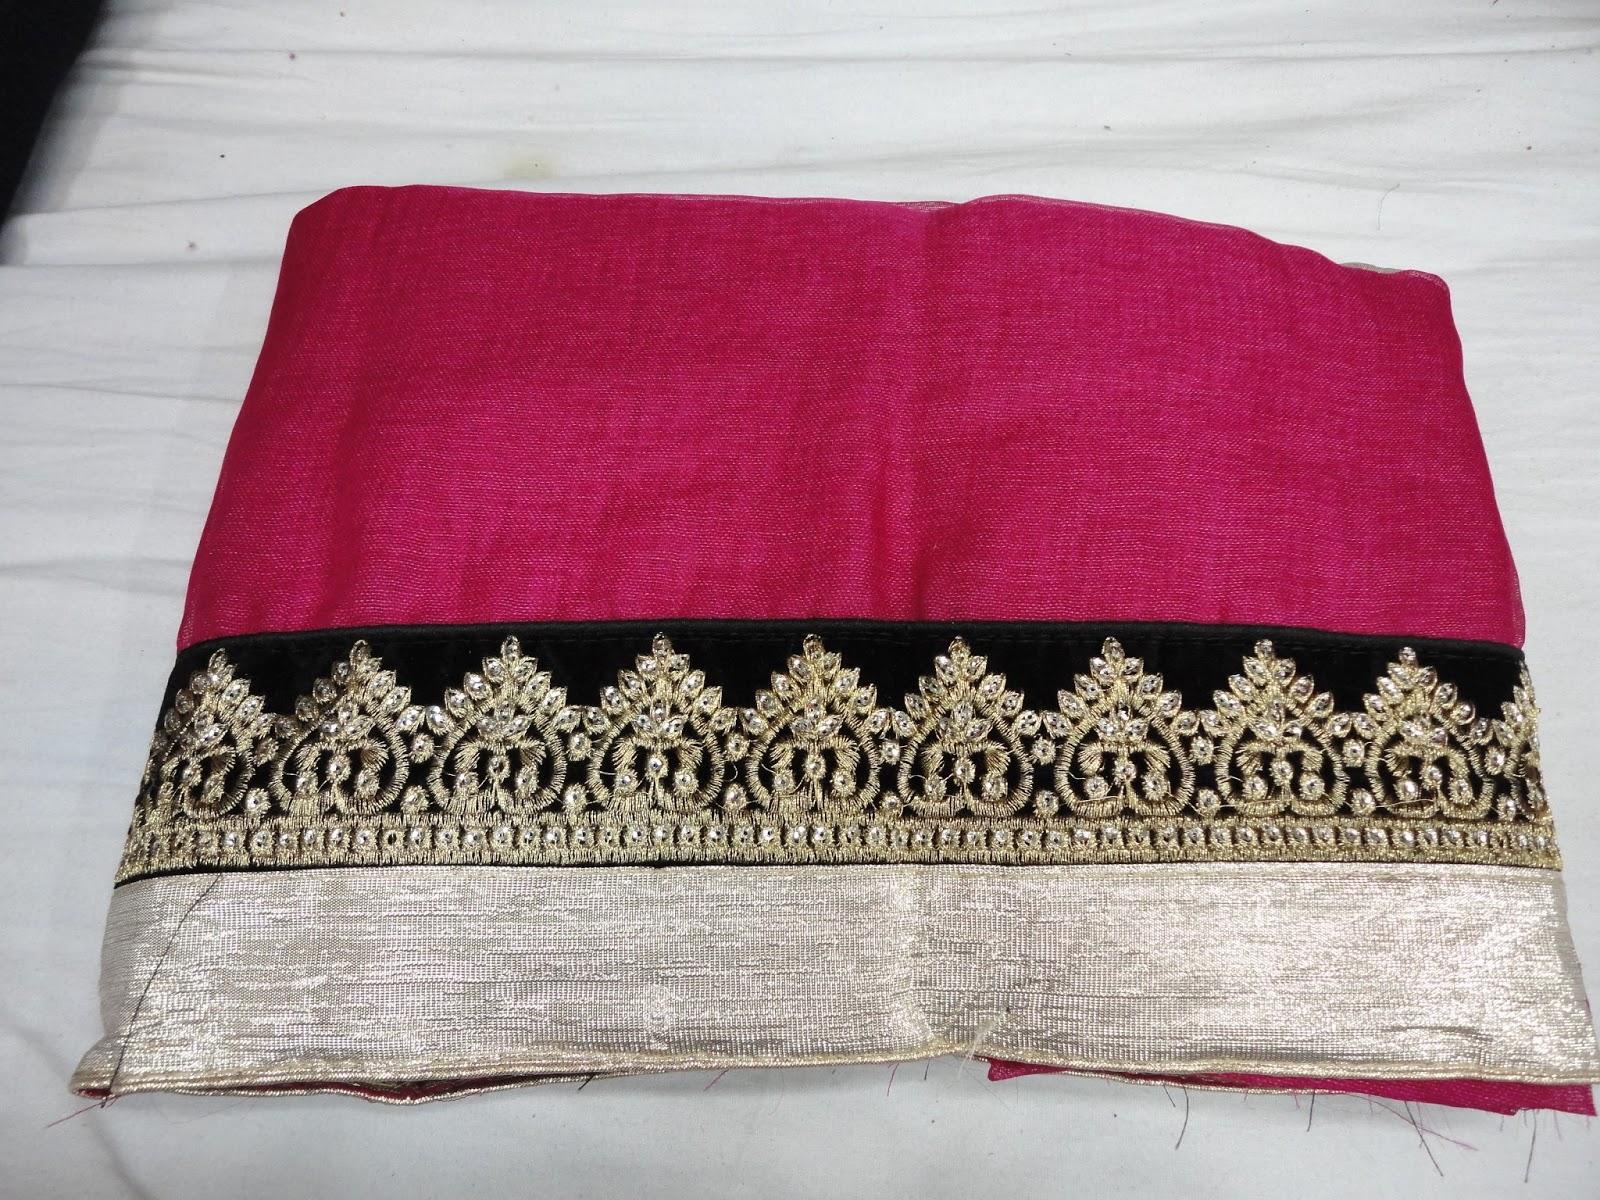 1233+-+Vidya-Balan-at-Bombay-Times-17th-anniversary-bash-at-JW-Marriott-Juhu-on-November-05-2011-+b+.JPG (1600×1200)